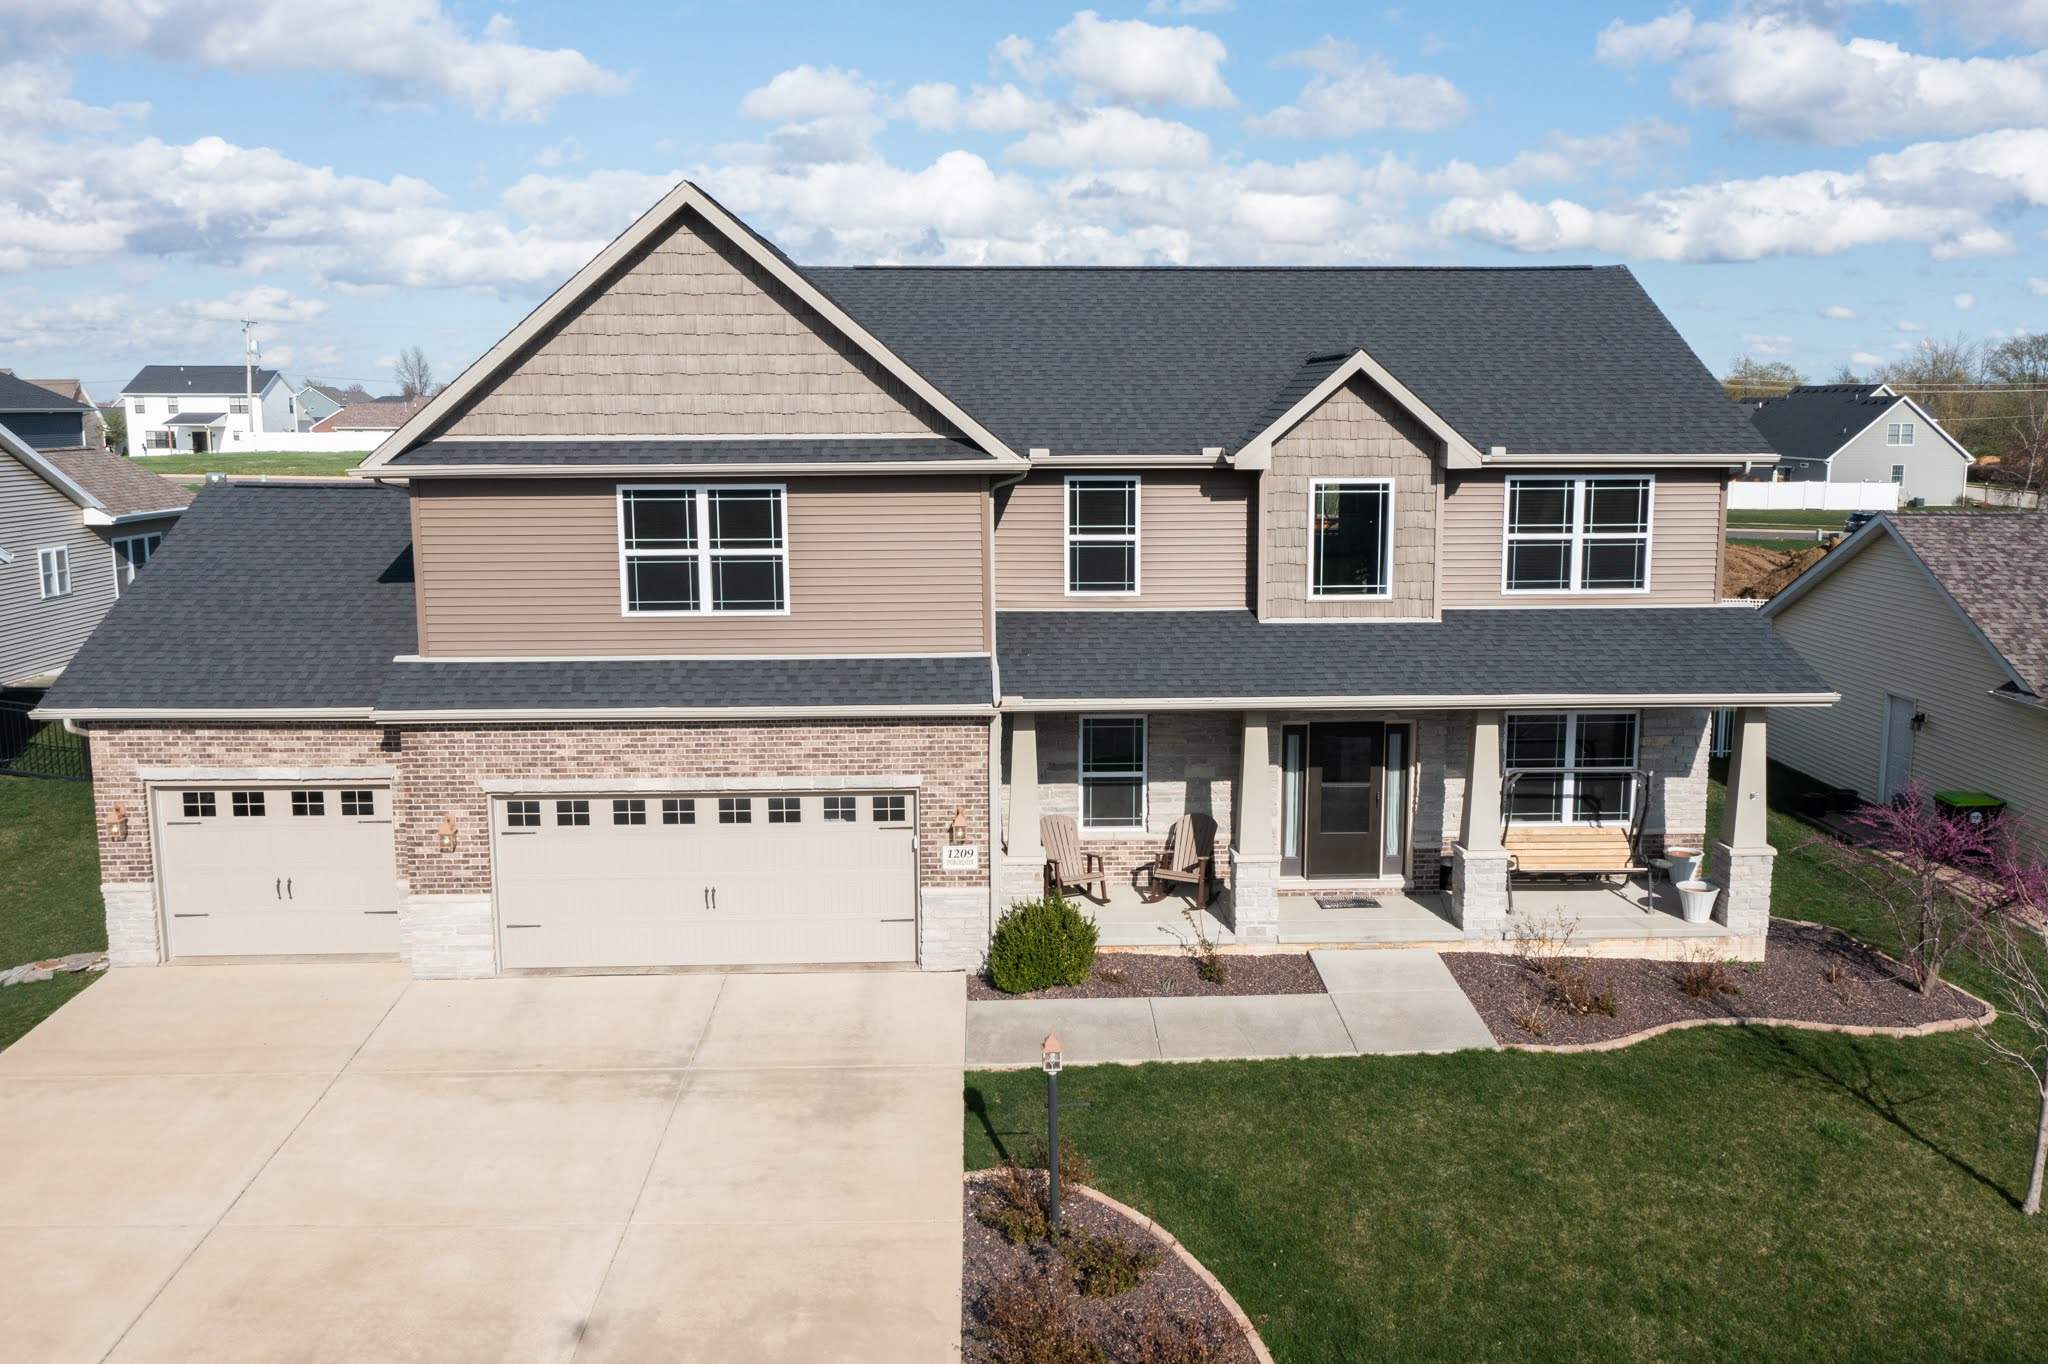 1209 DORCHESTER Property Photo - Washington, IL real estate listing